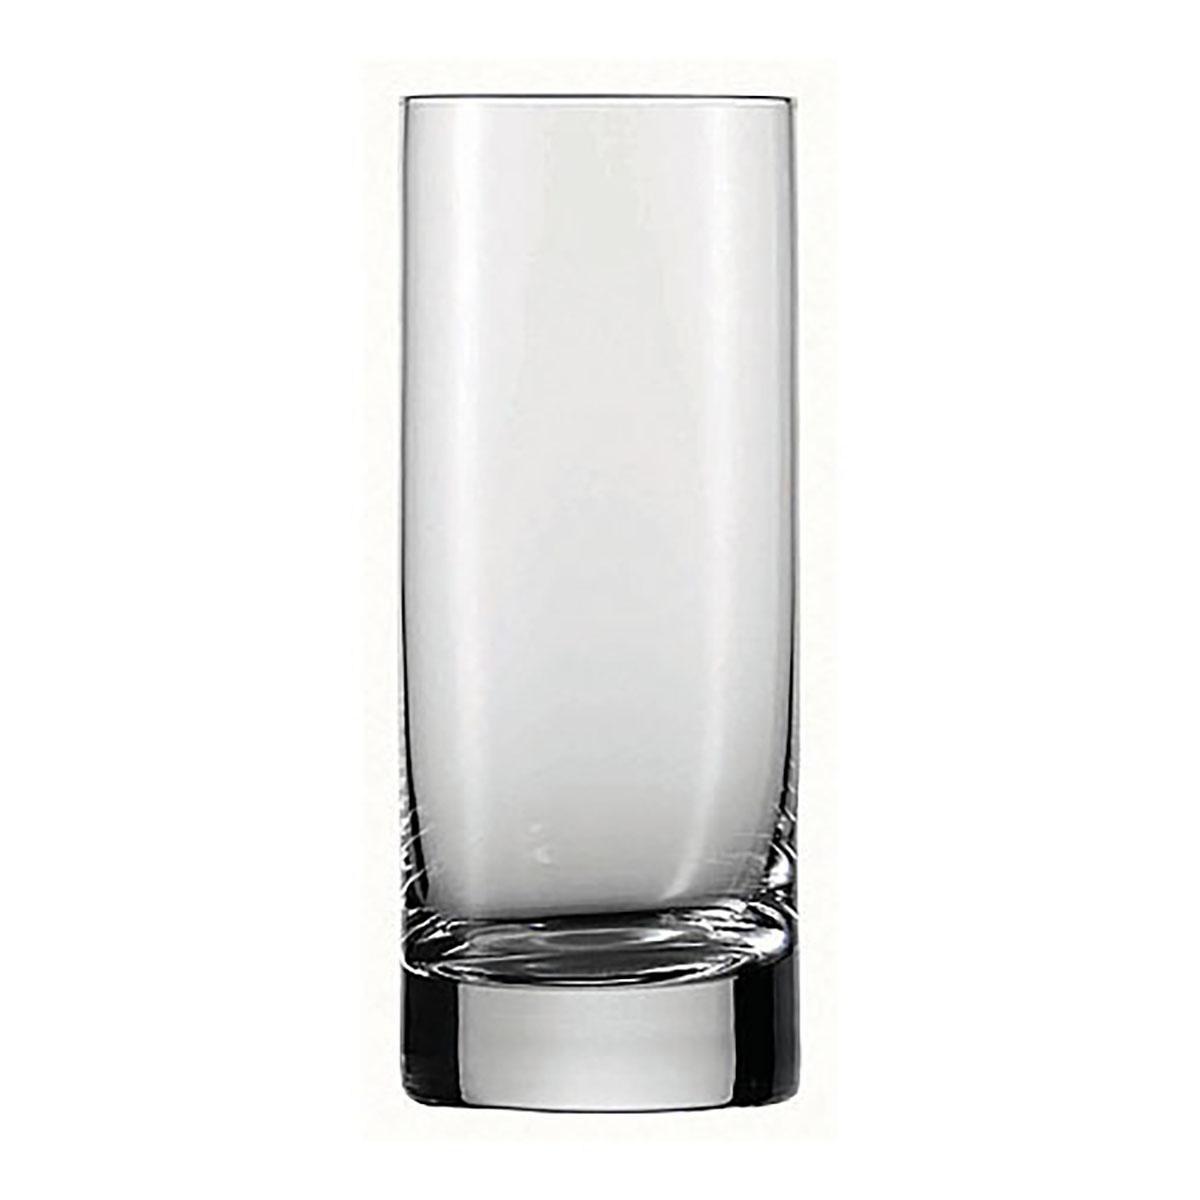 Schott Zwiesel Tritan Crystal, Paris Collins Longdrink Glass, Set of Six